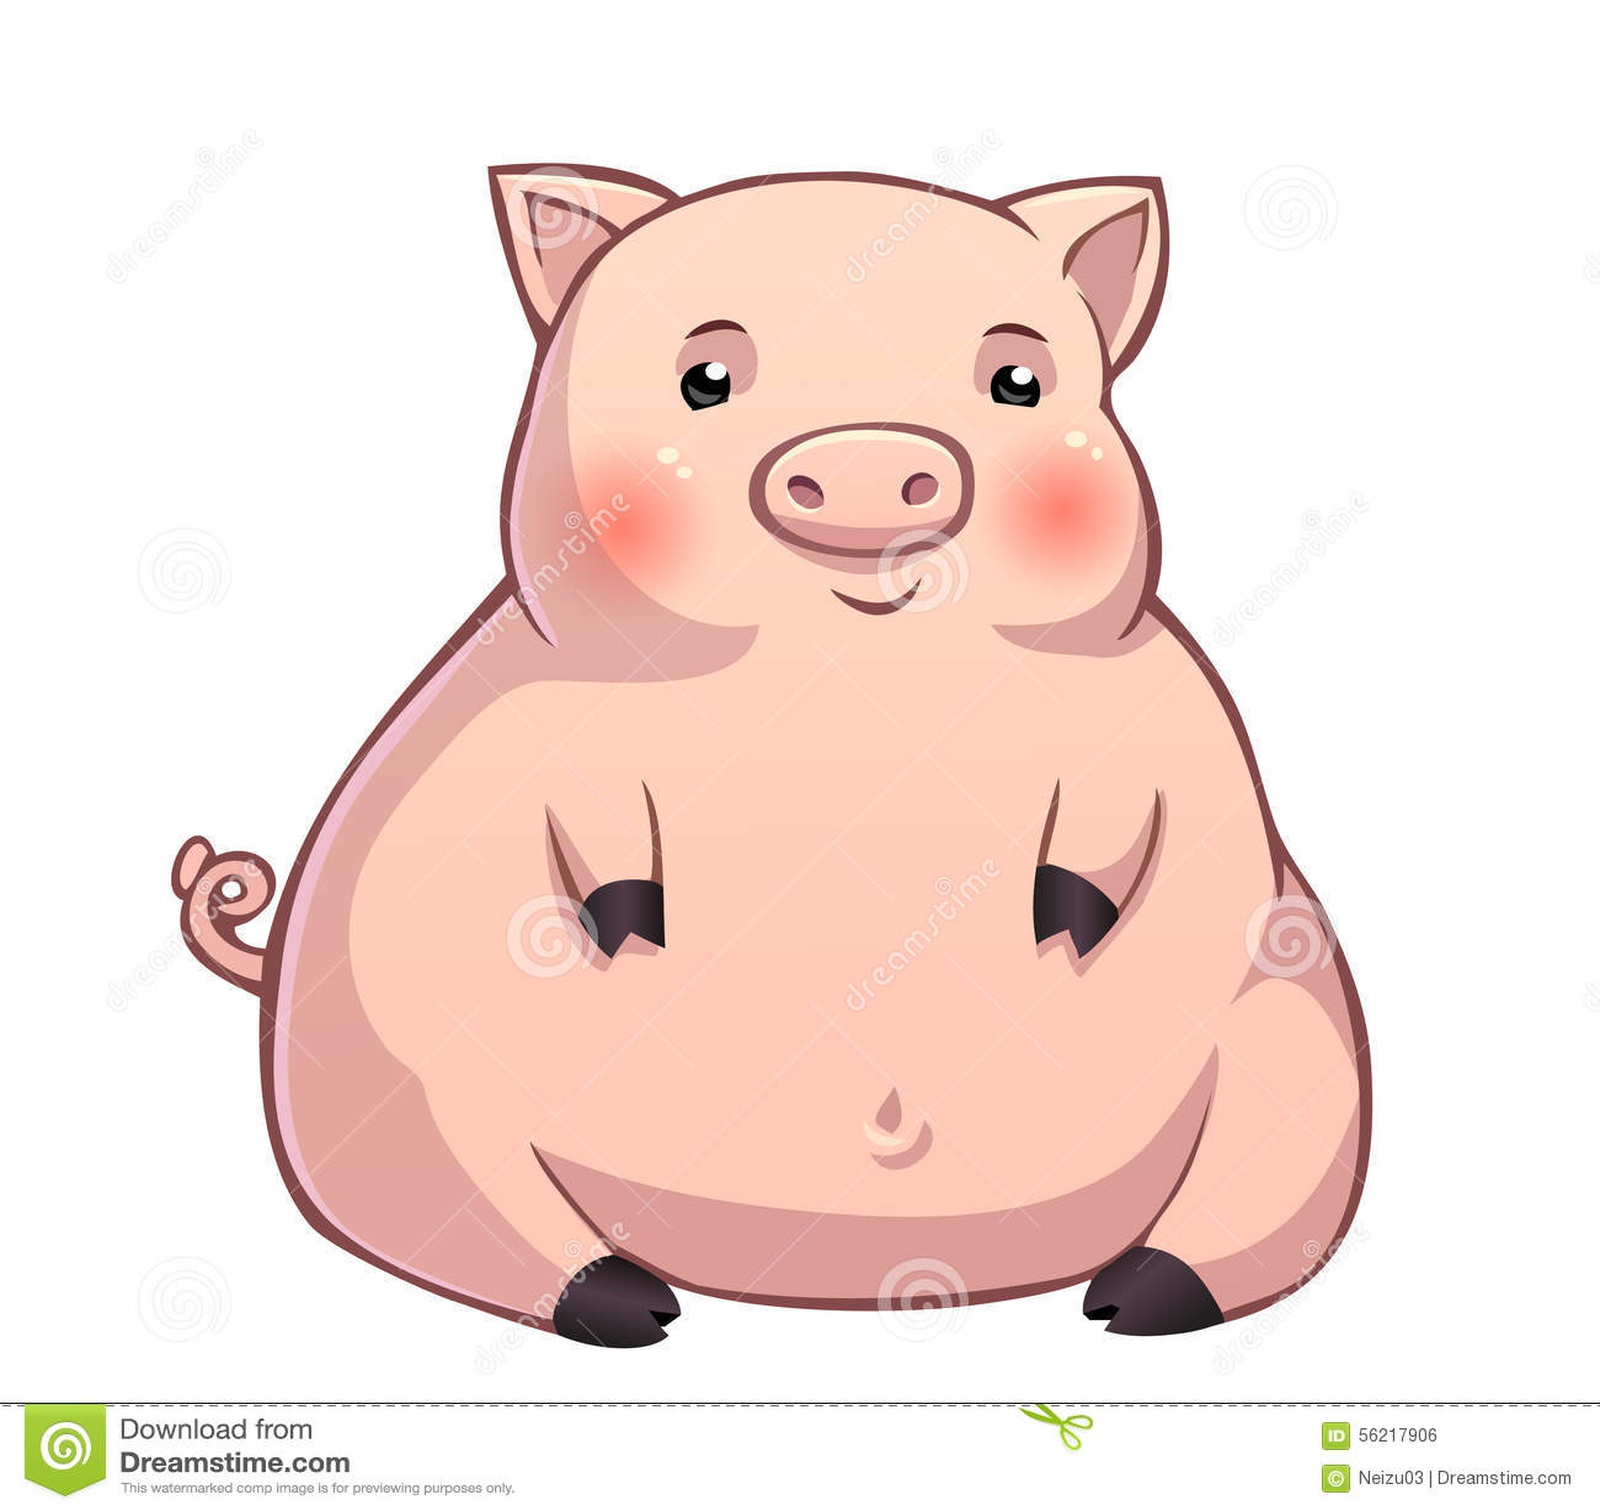 cute fat pink piglet stock illustration image 56217906 Cute Farm Animals Clip Art Cute Baby Animal Clip Art